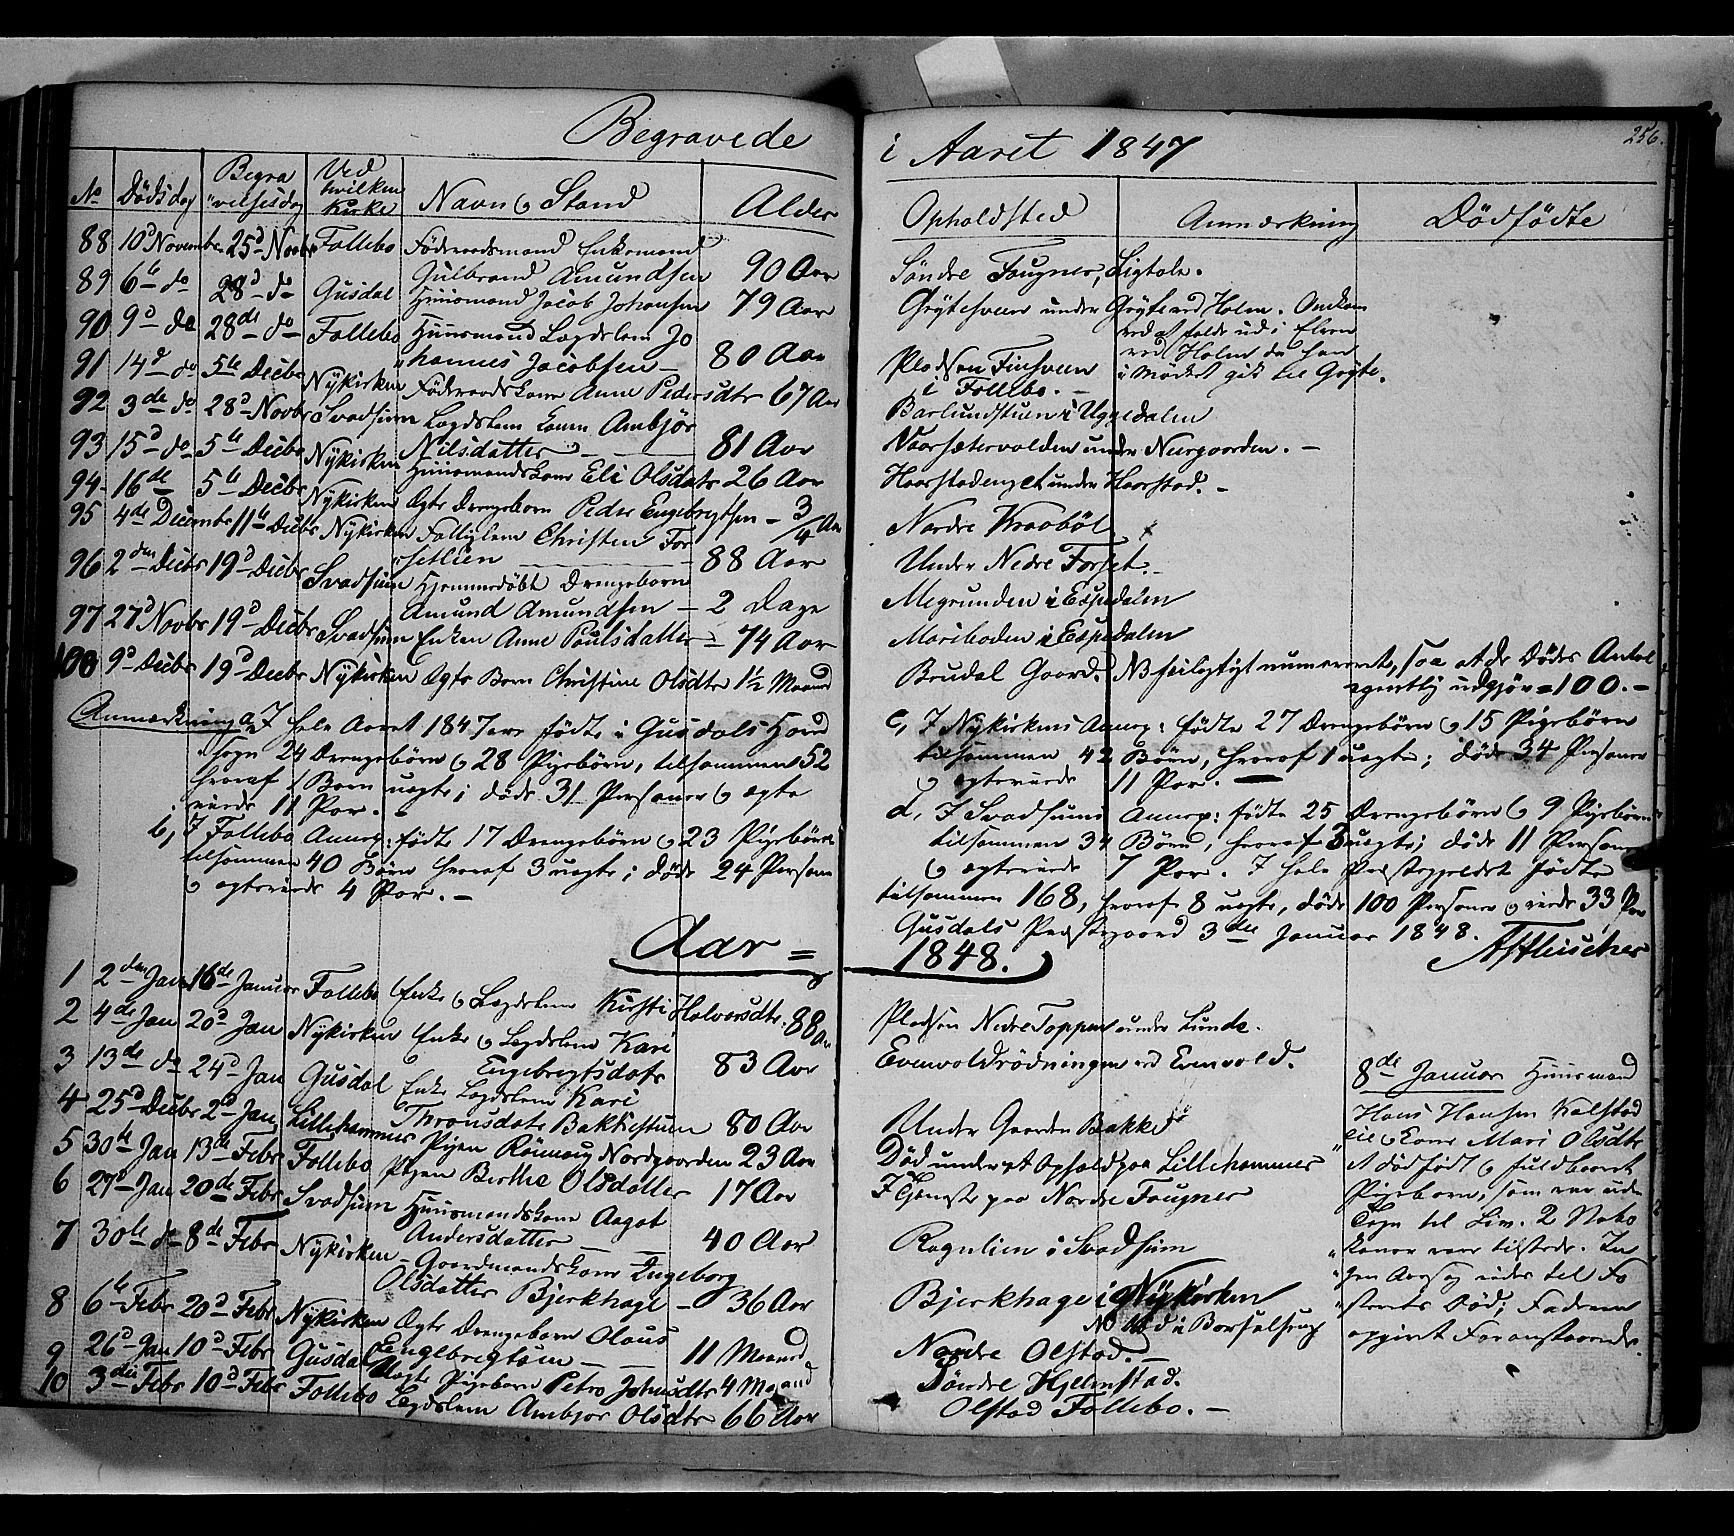 SAH, Gausdal prestekontor, Ministerialbok nr. 7, 1840-1850, s. 256